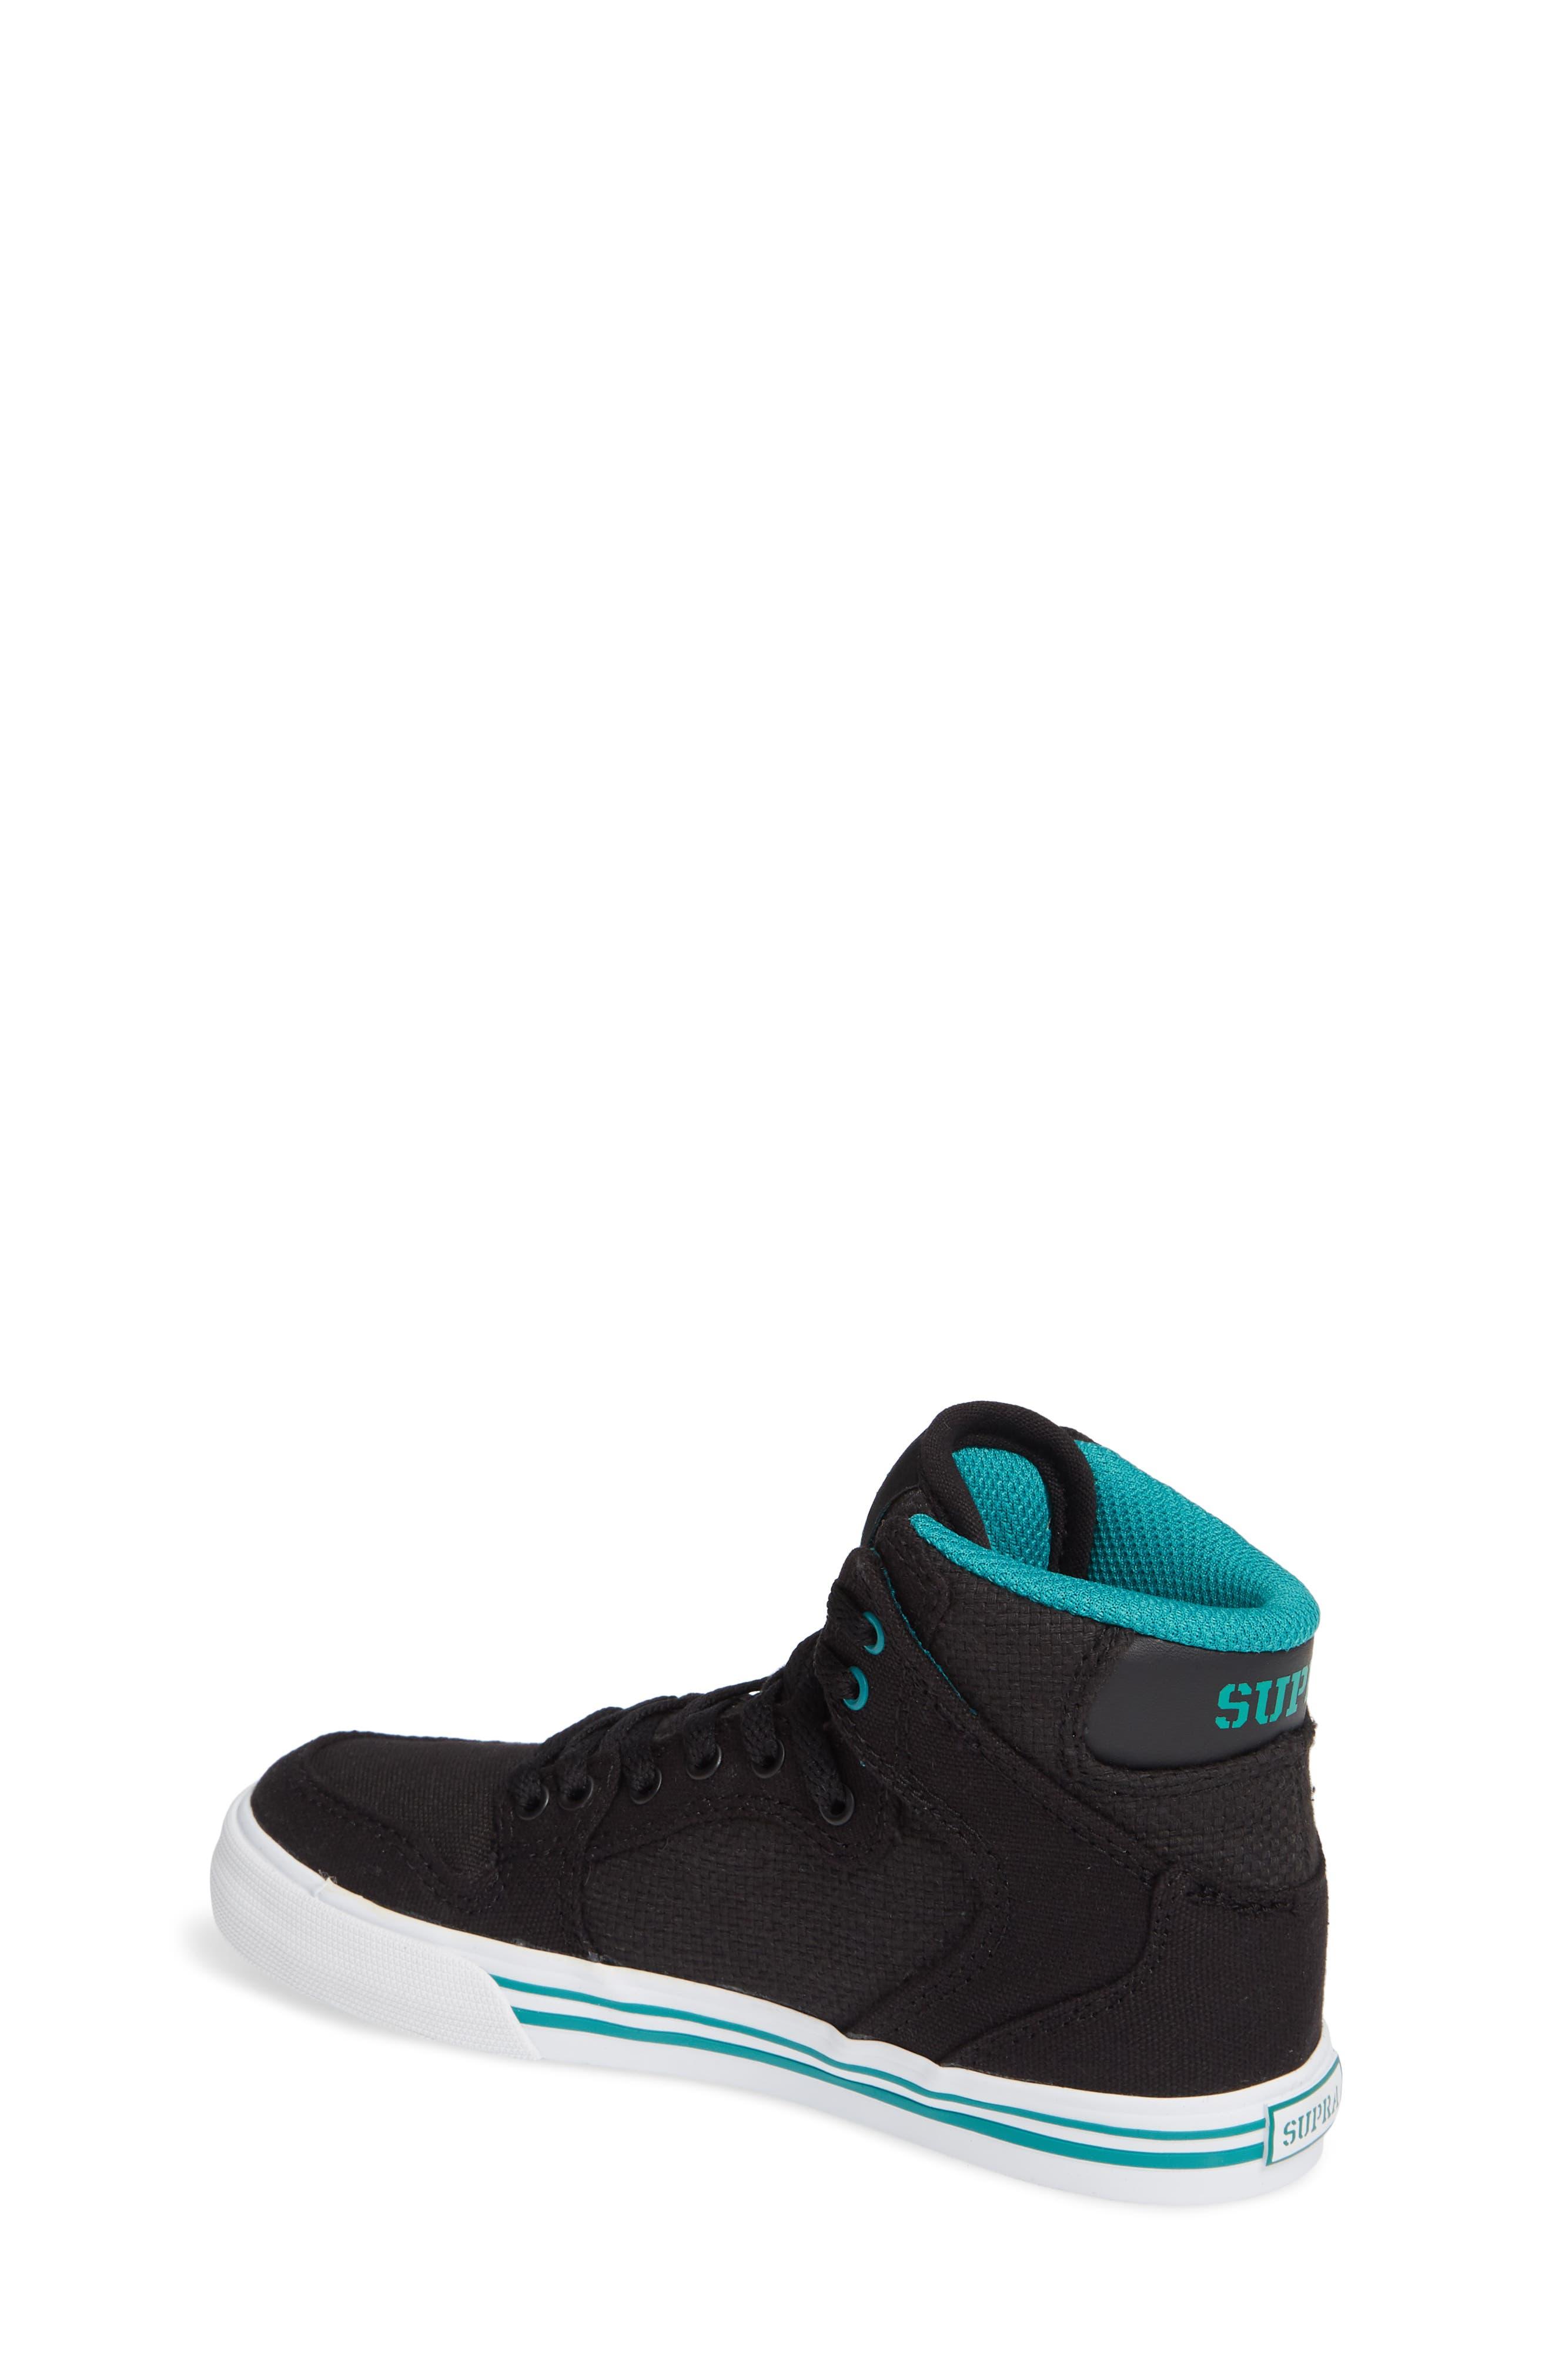 'Vaider' High Top Sneaker,                             Alternate thumbnail 2, color,                             BLACK/ TEAL